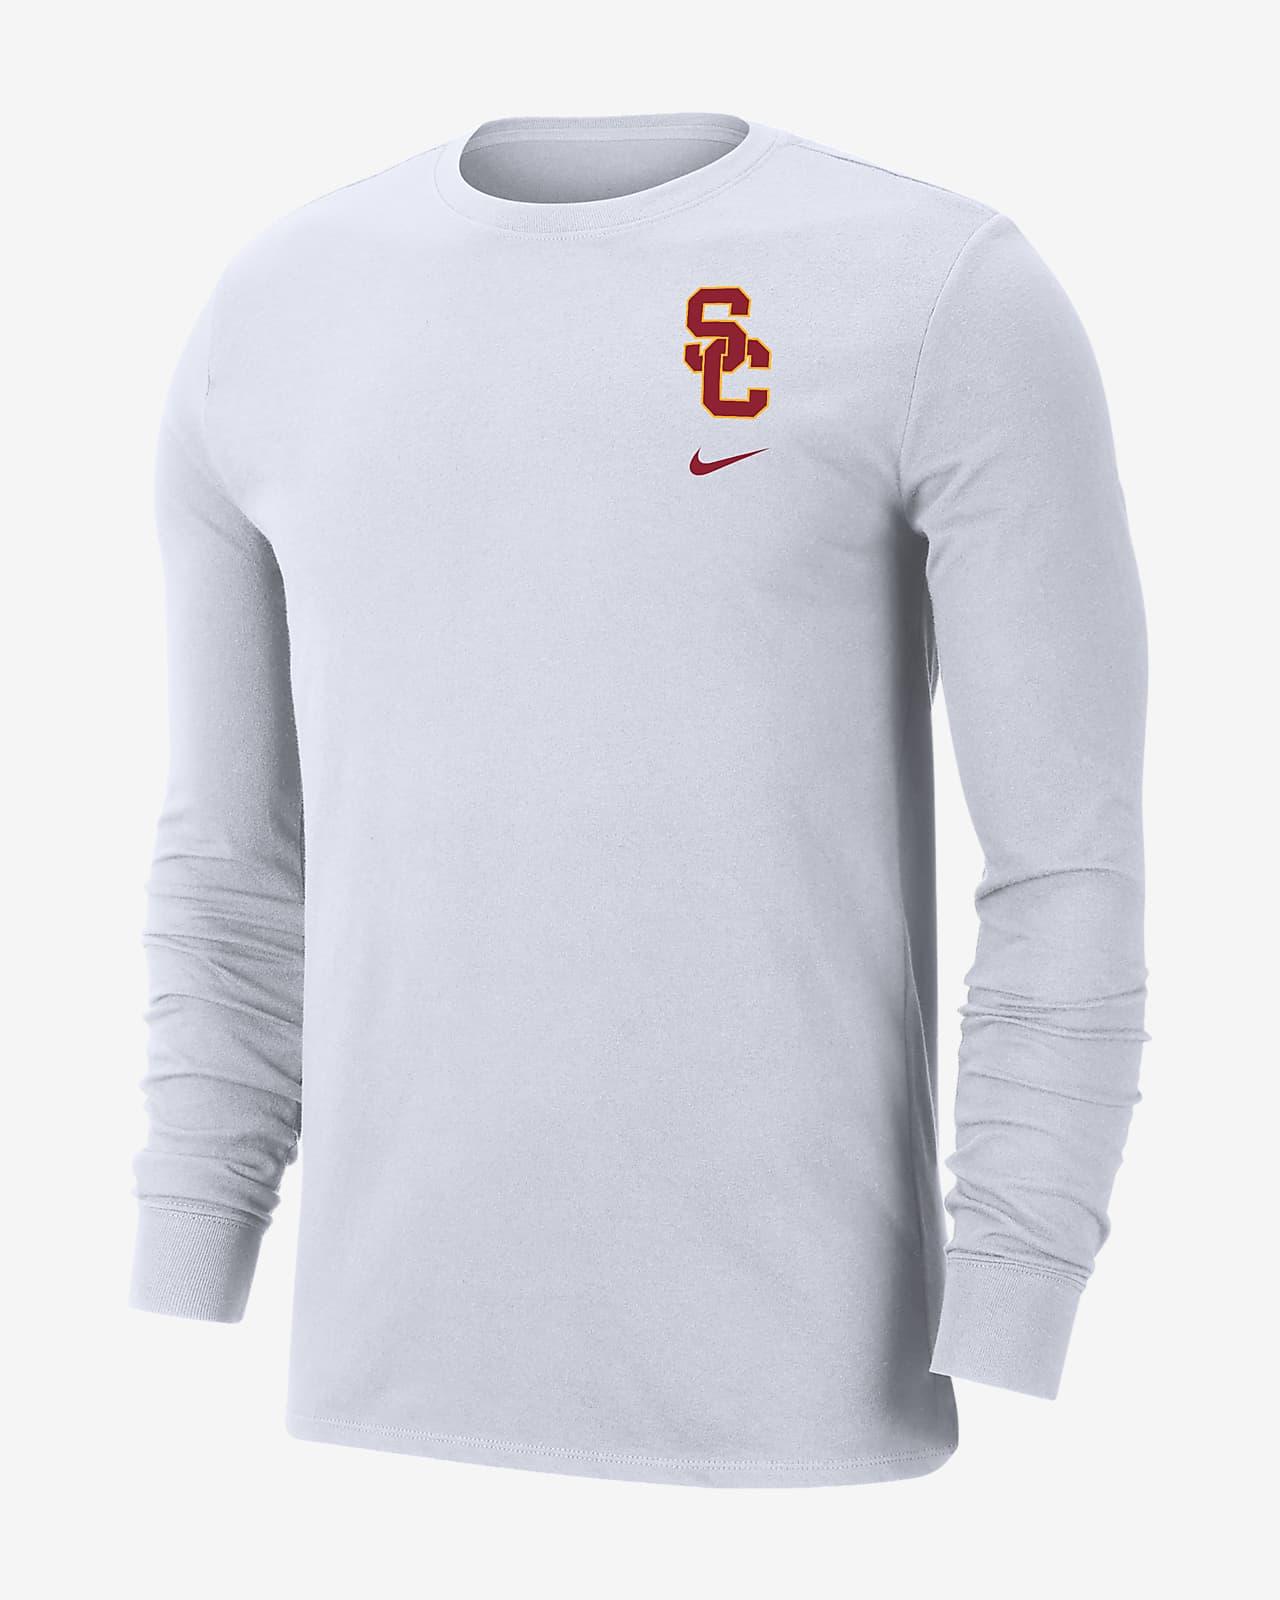 Nike College (USC) Men's Long-Sleeve T-Shirt